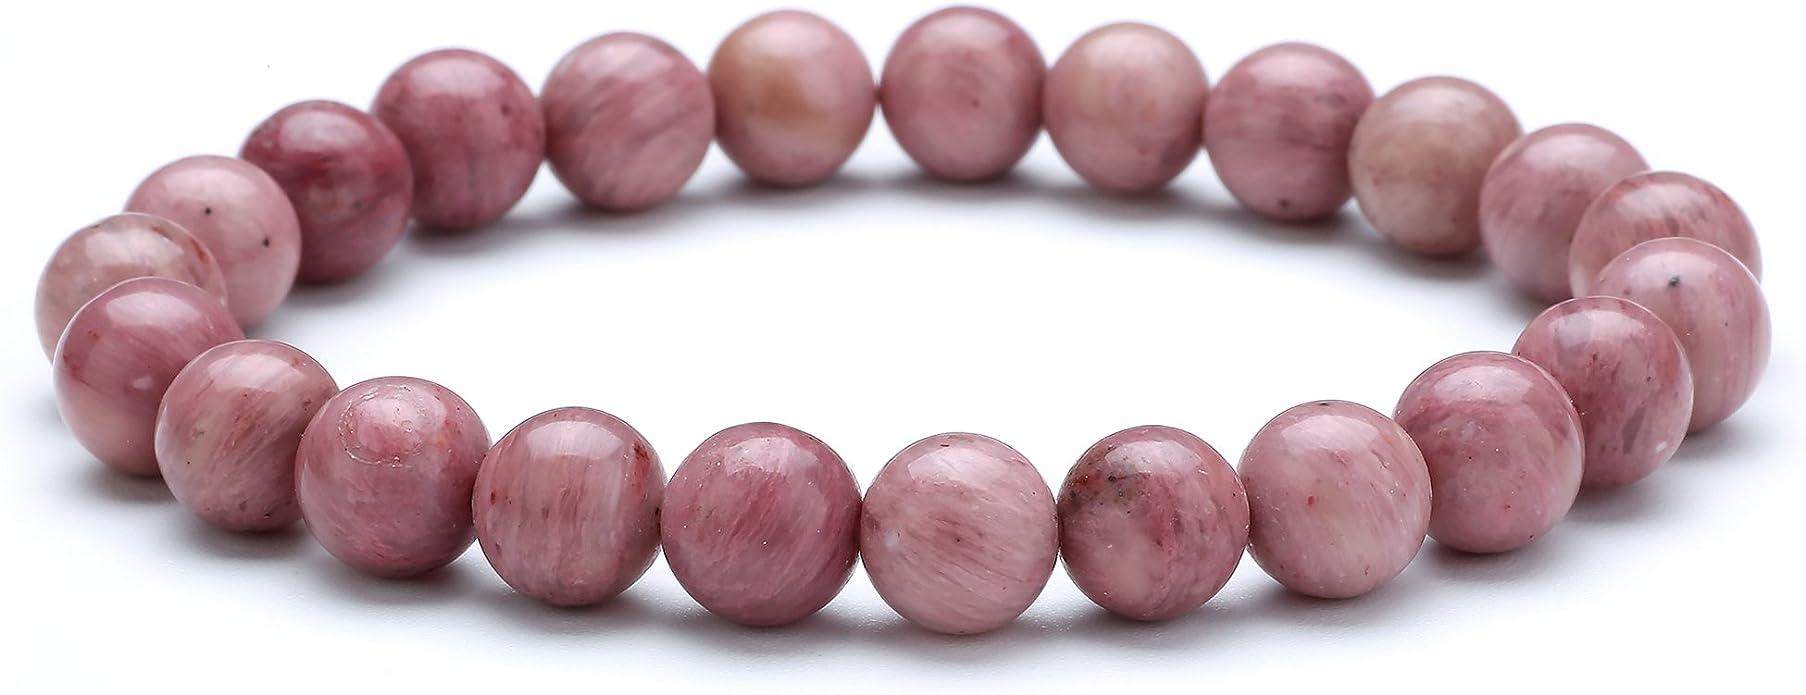 Rhodonite Rodochrosite Stretch Bracelets beads 8mm